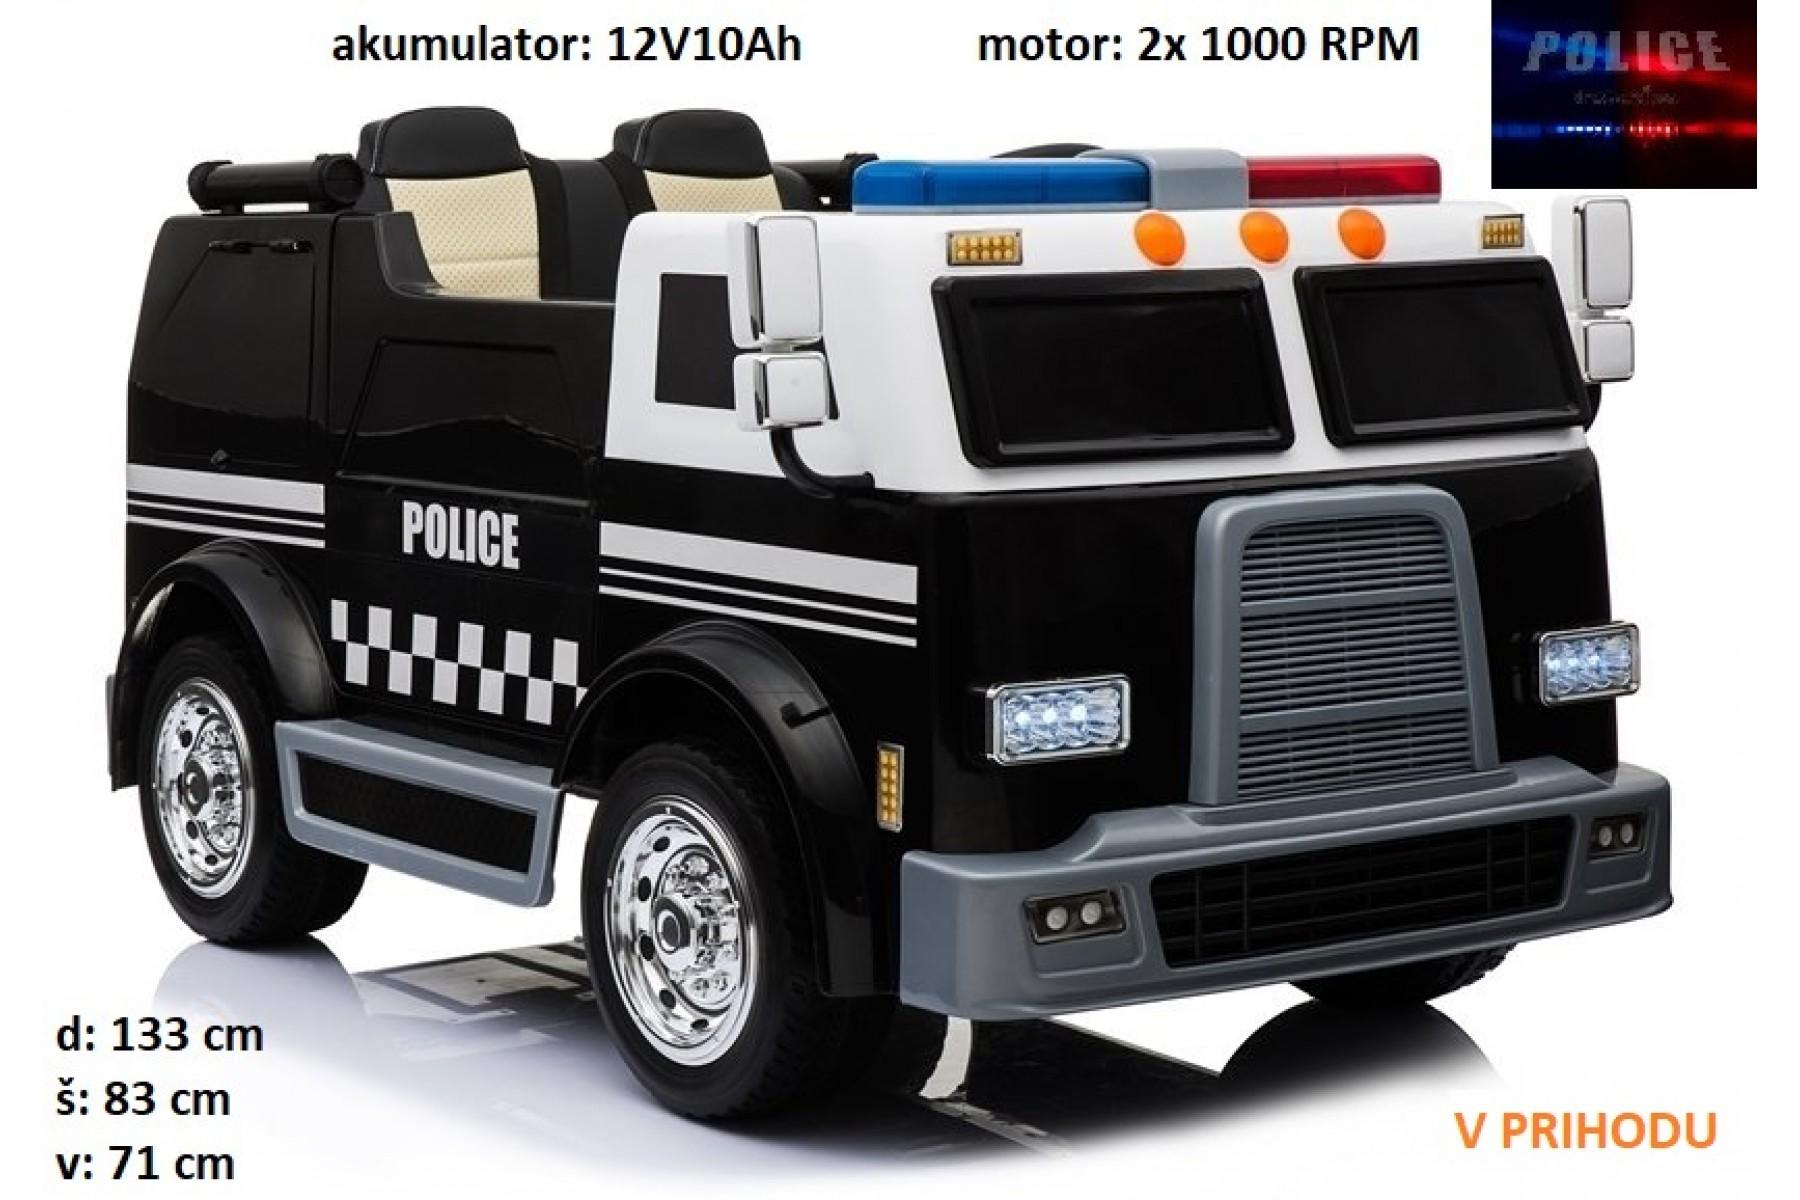 otroški POLICIJSKI tovornjak (dvosed)